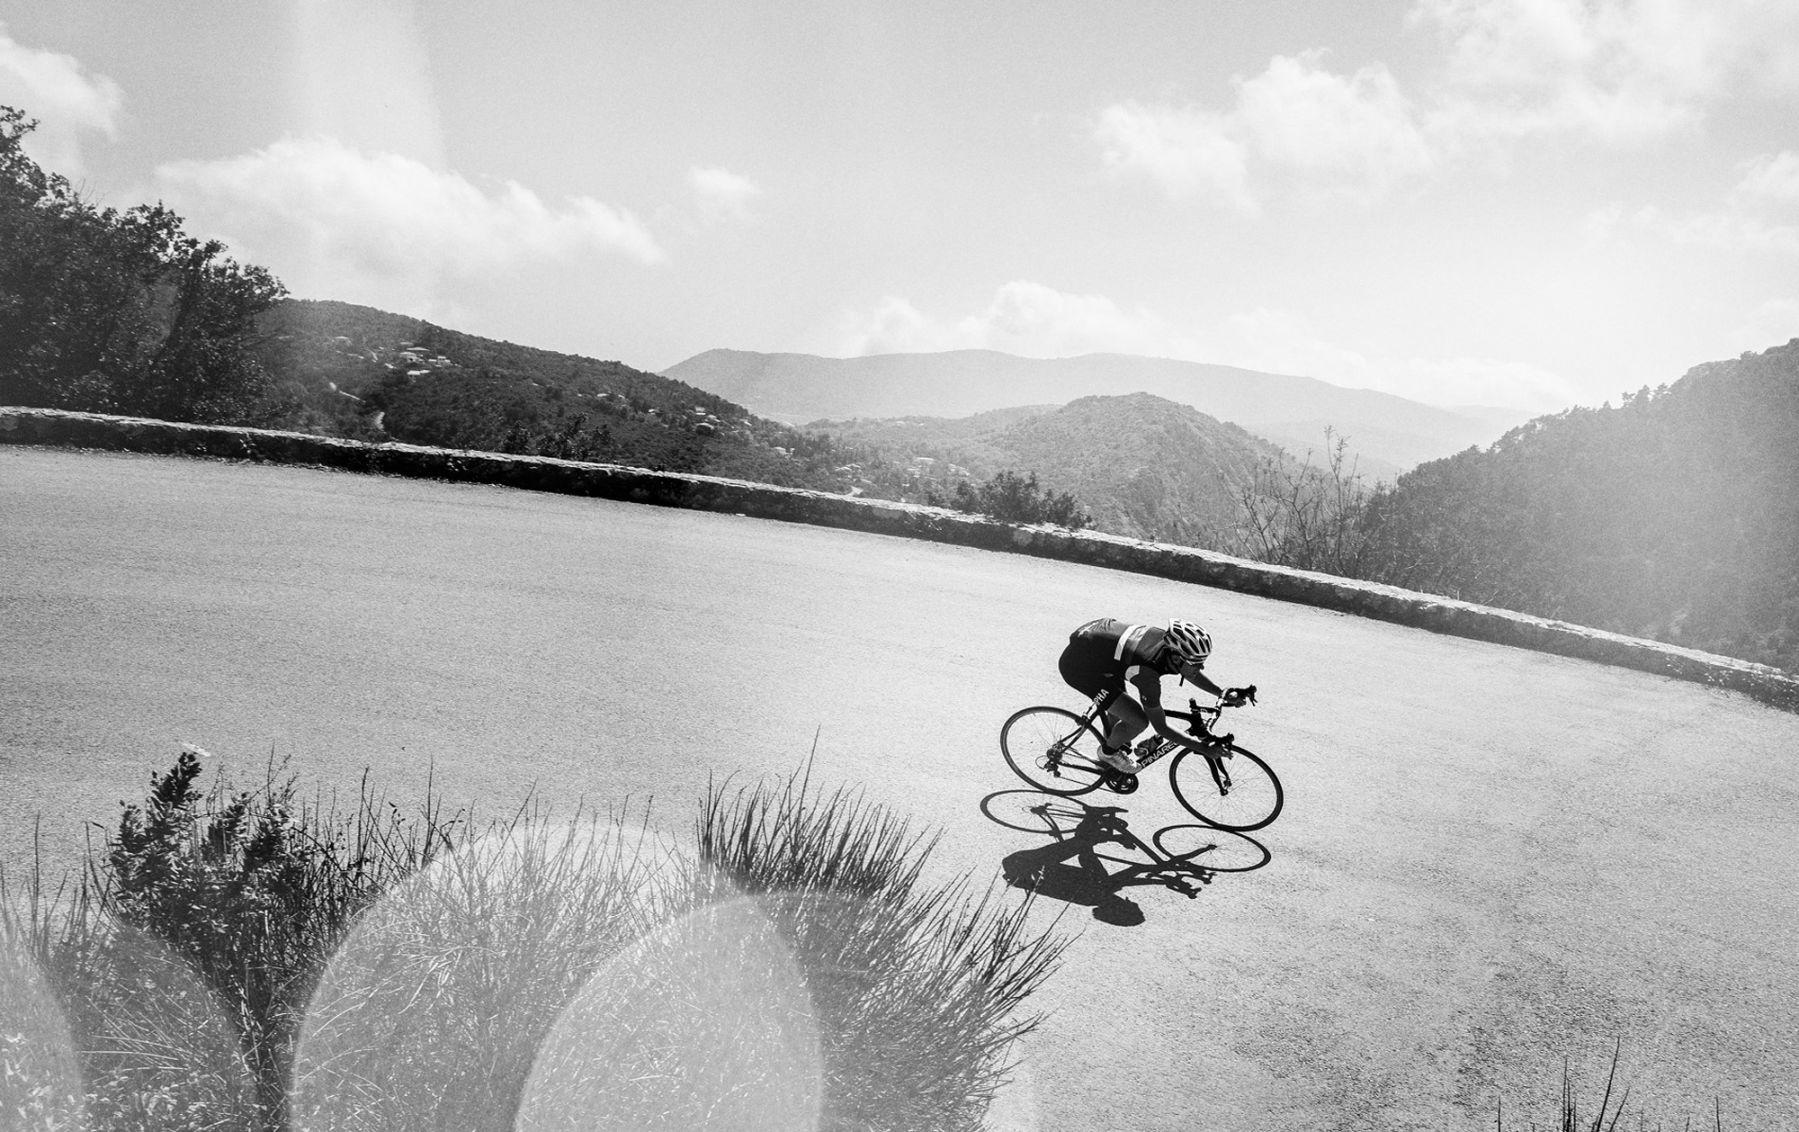 Paul-Calver-goodfromyou-5-Cyclist.jpg